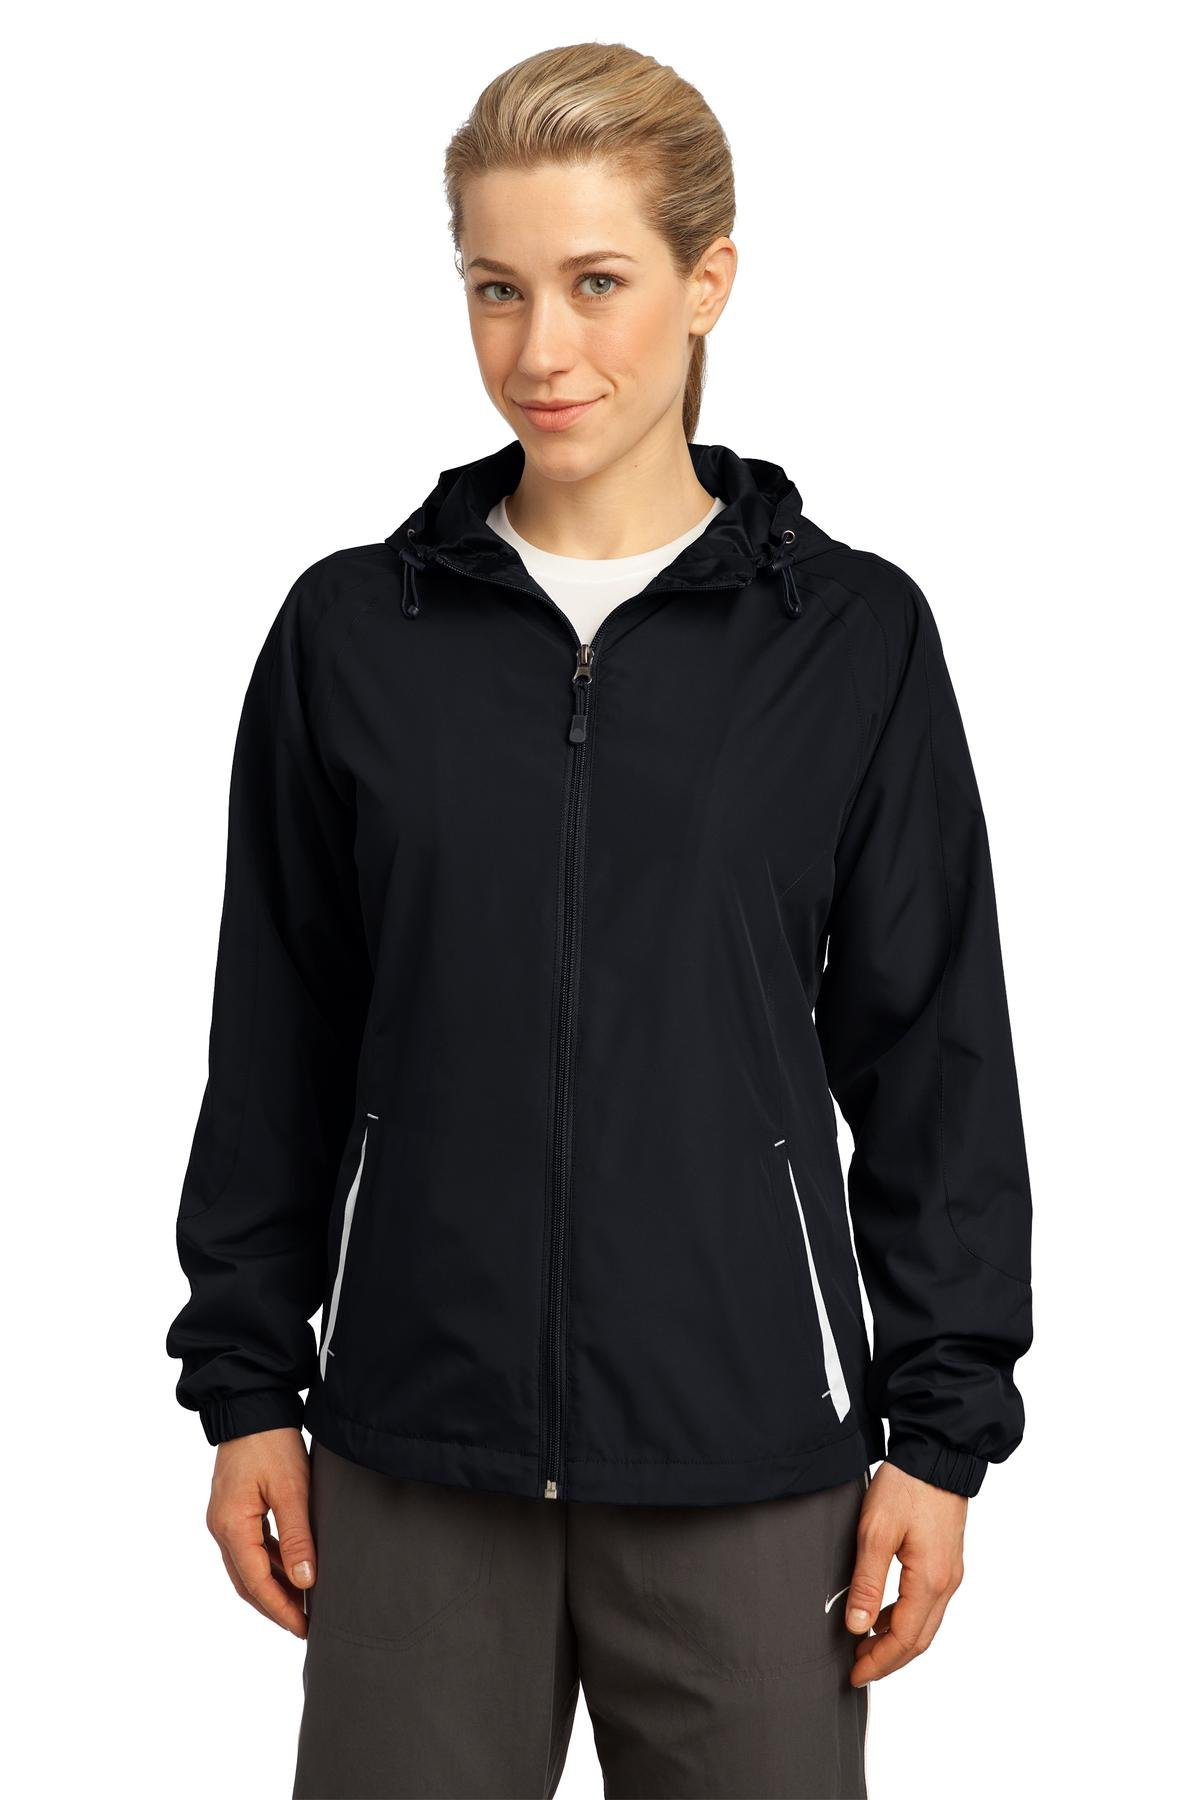 Sport-Tek Women's Colorblock Hooded Raglan Jacket 4XL Black/White